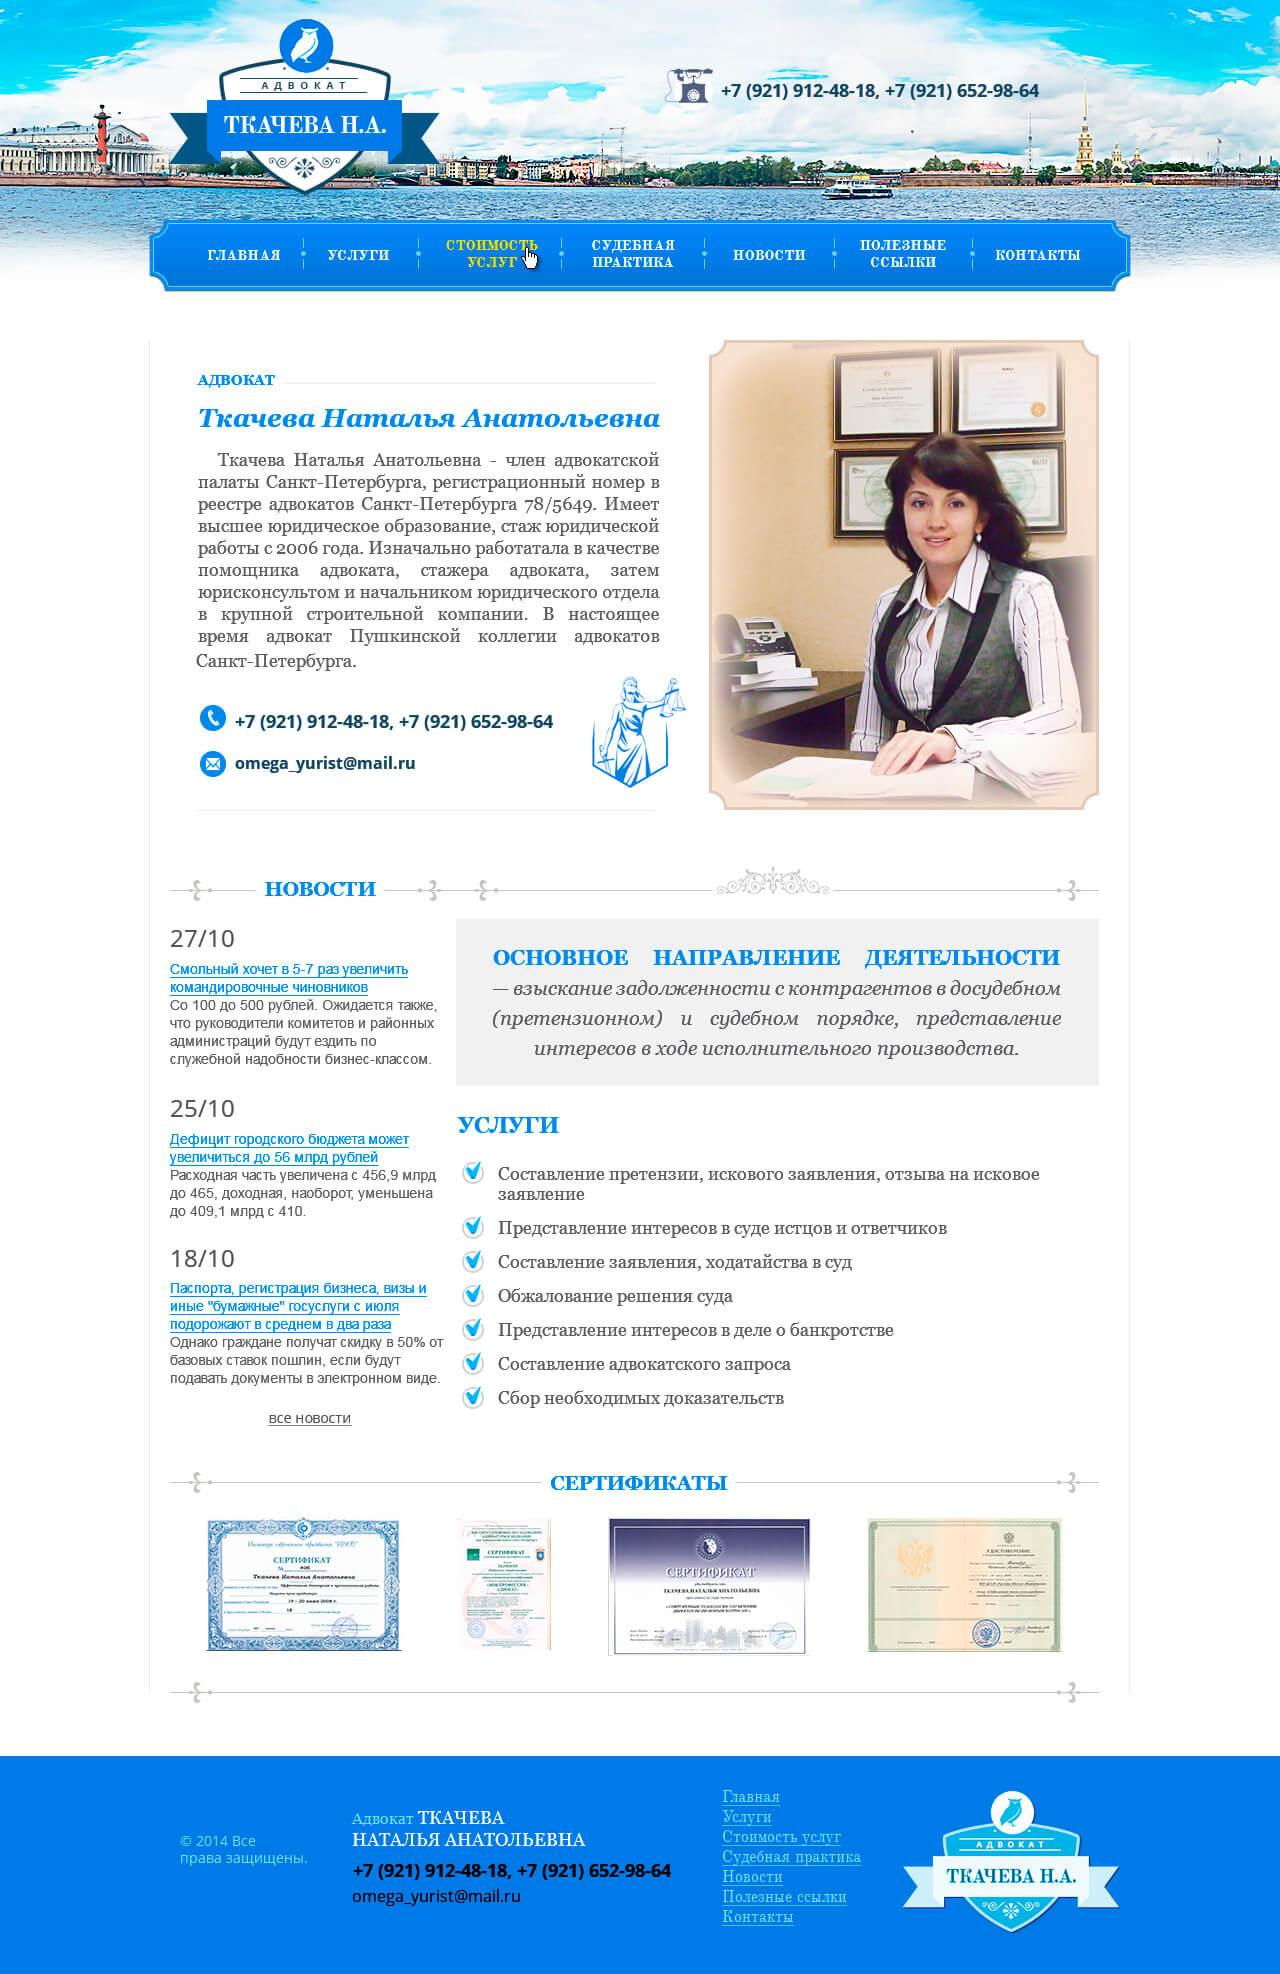 Сайт-визитка «Адвокатские и юридические услуги»